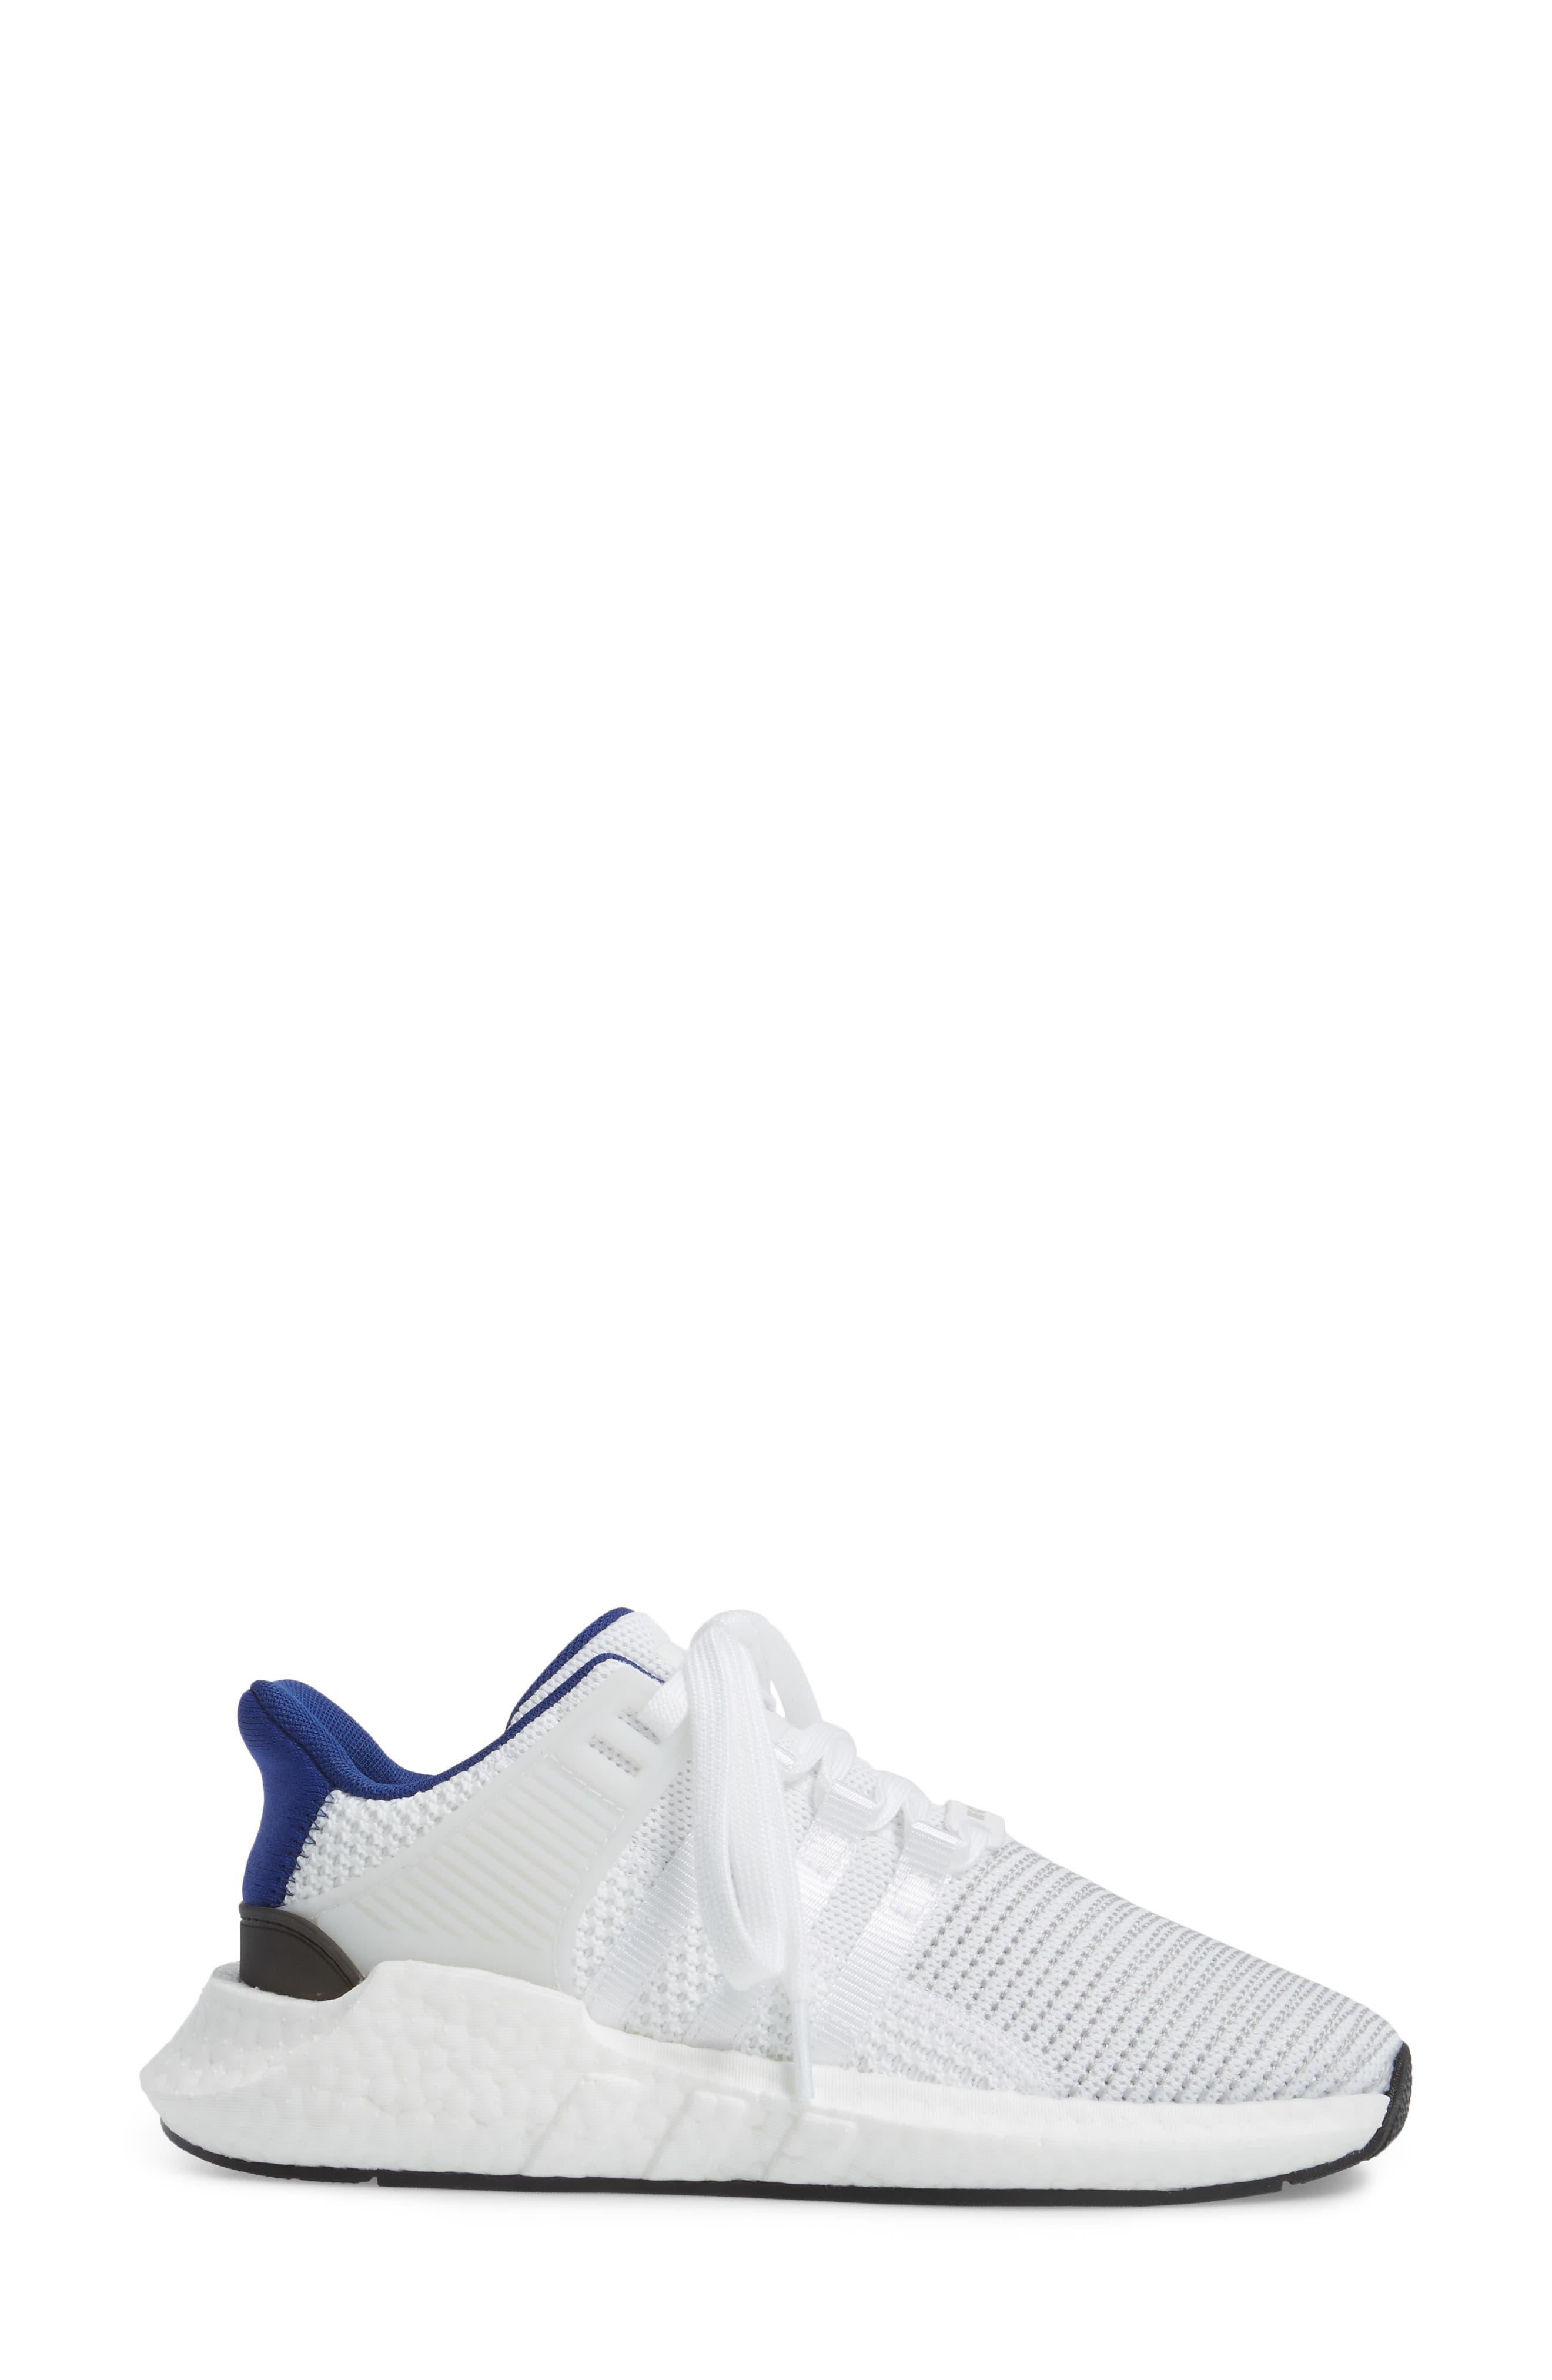 EQT Support 93/17 Sneaker,                             Alternate thumbnail 20, color,